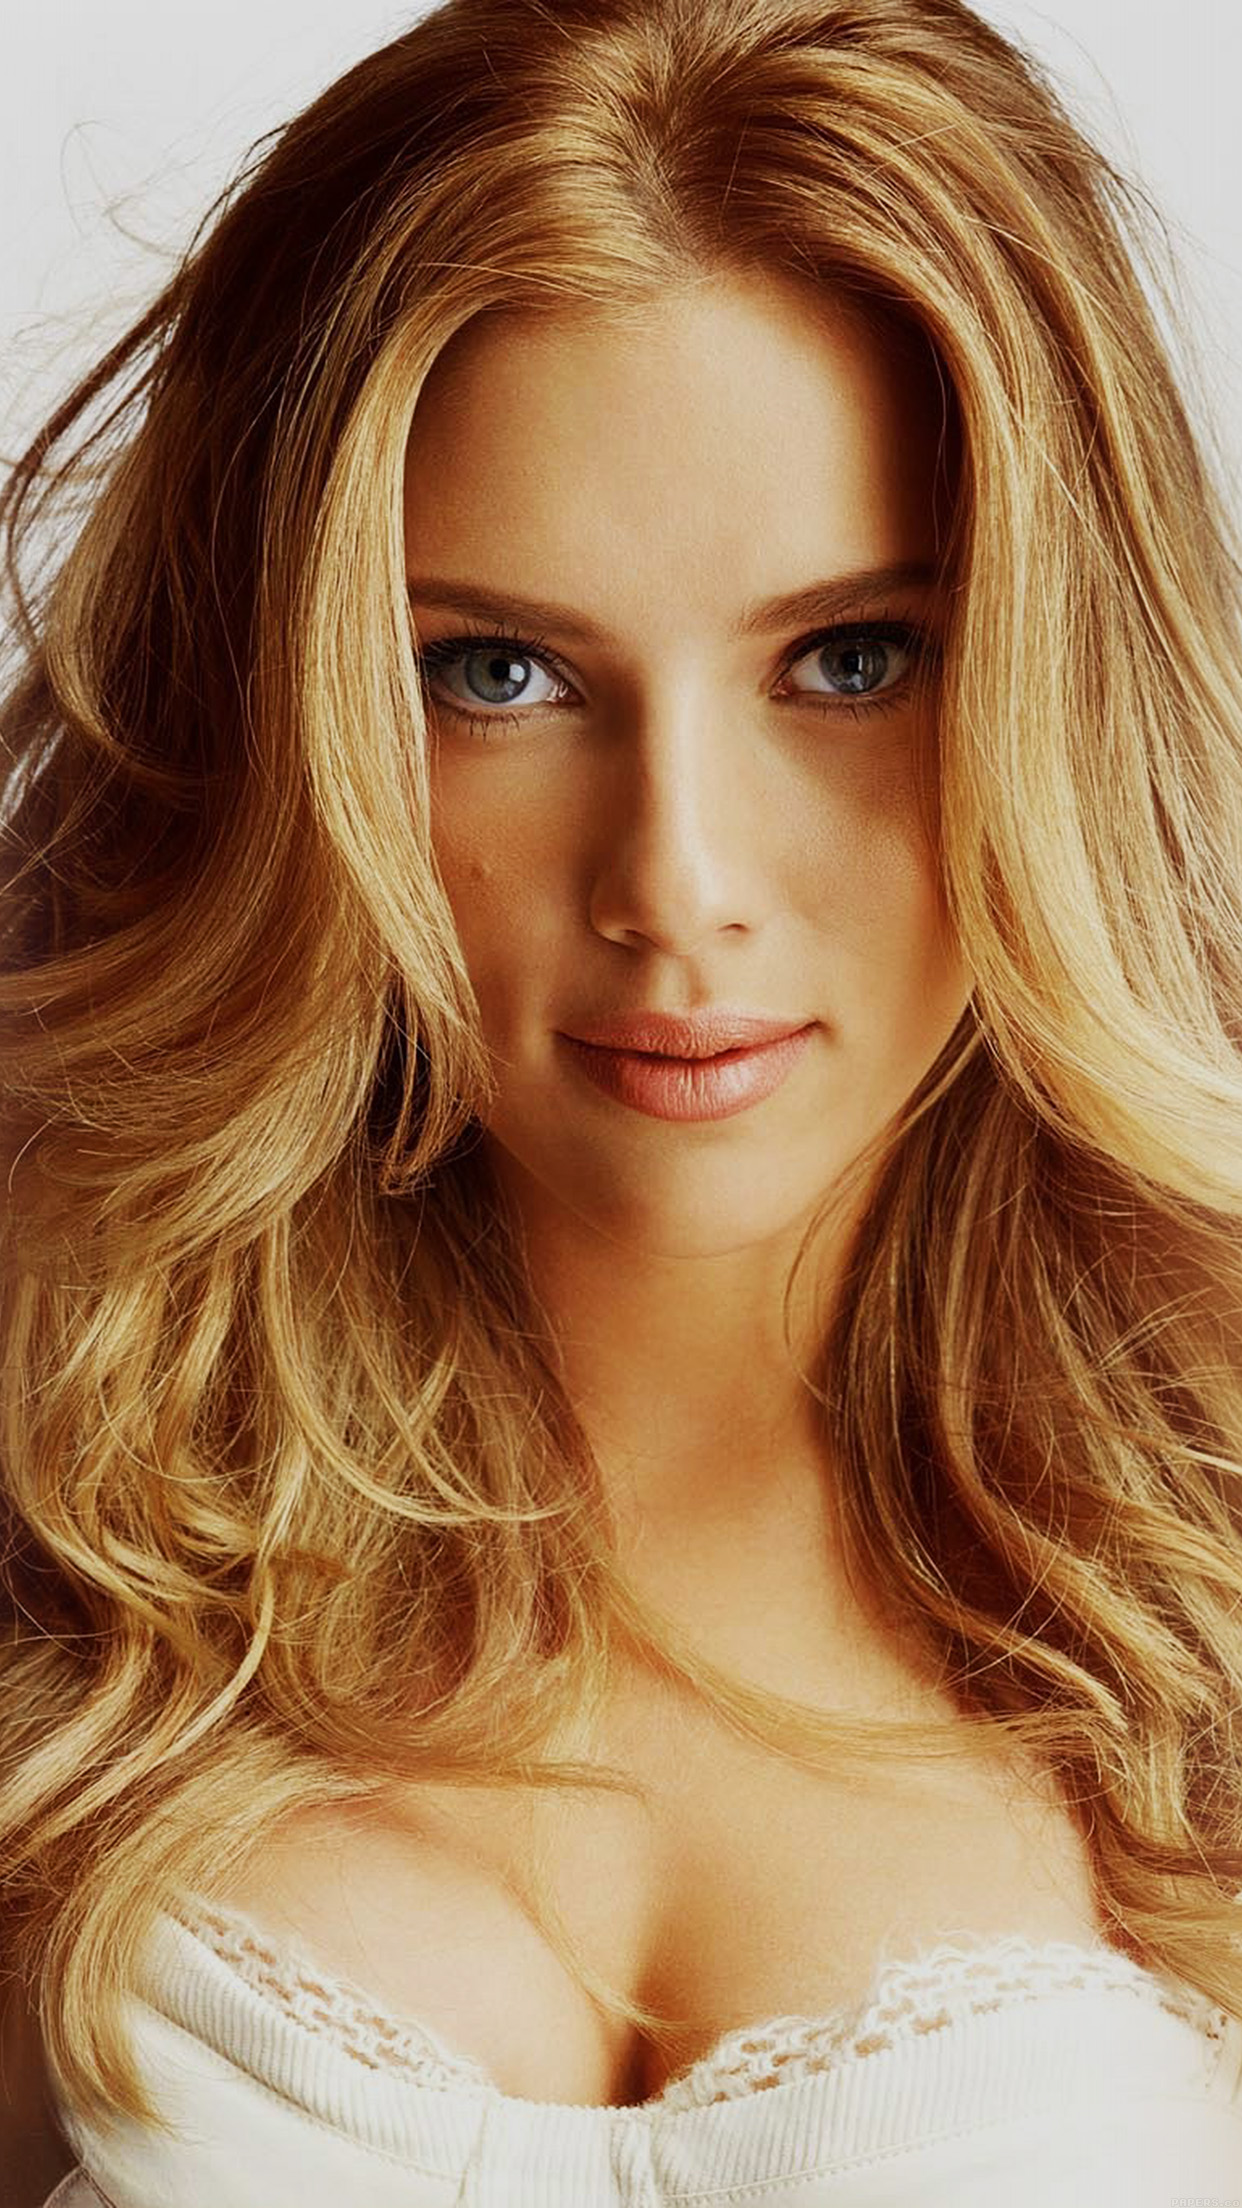 Hd34 Scarlett Johansson Smile Sexy Celebrity